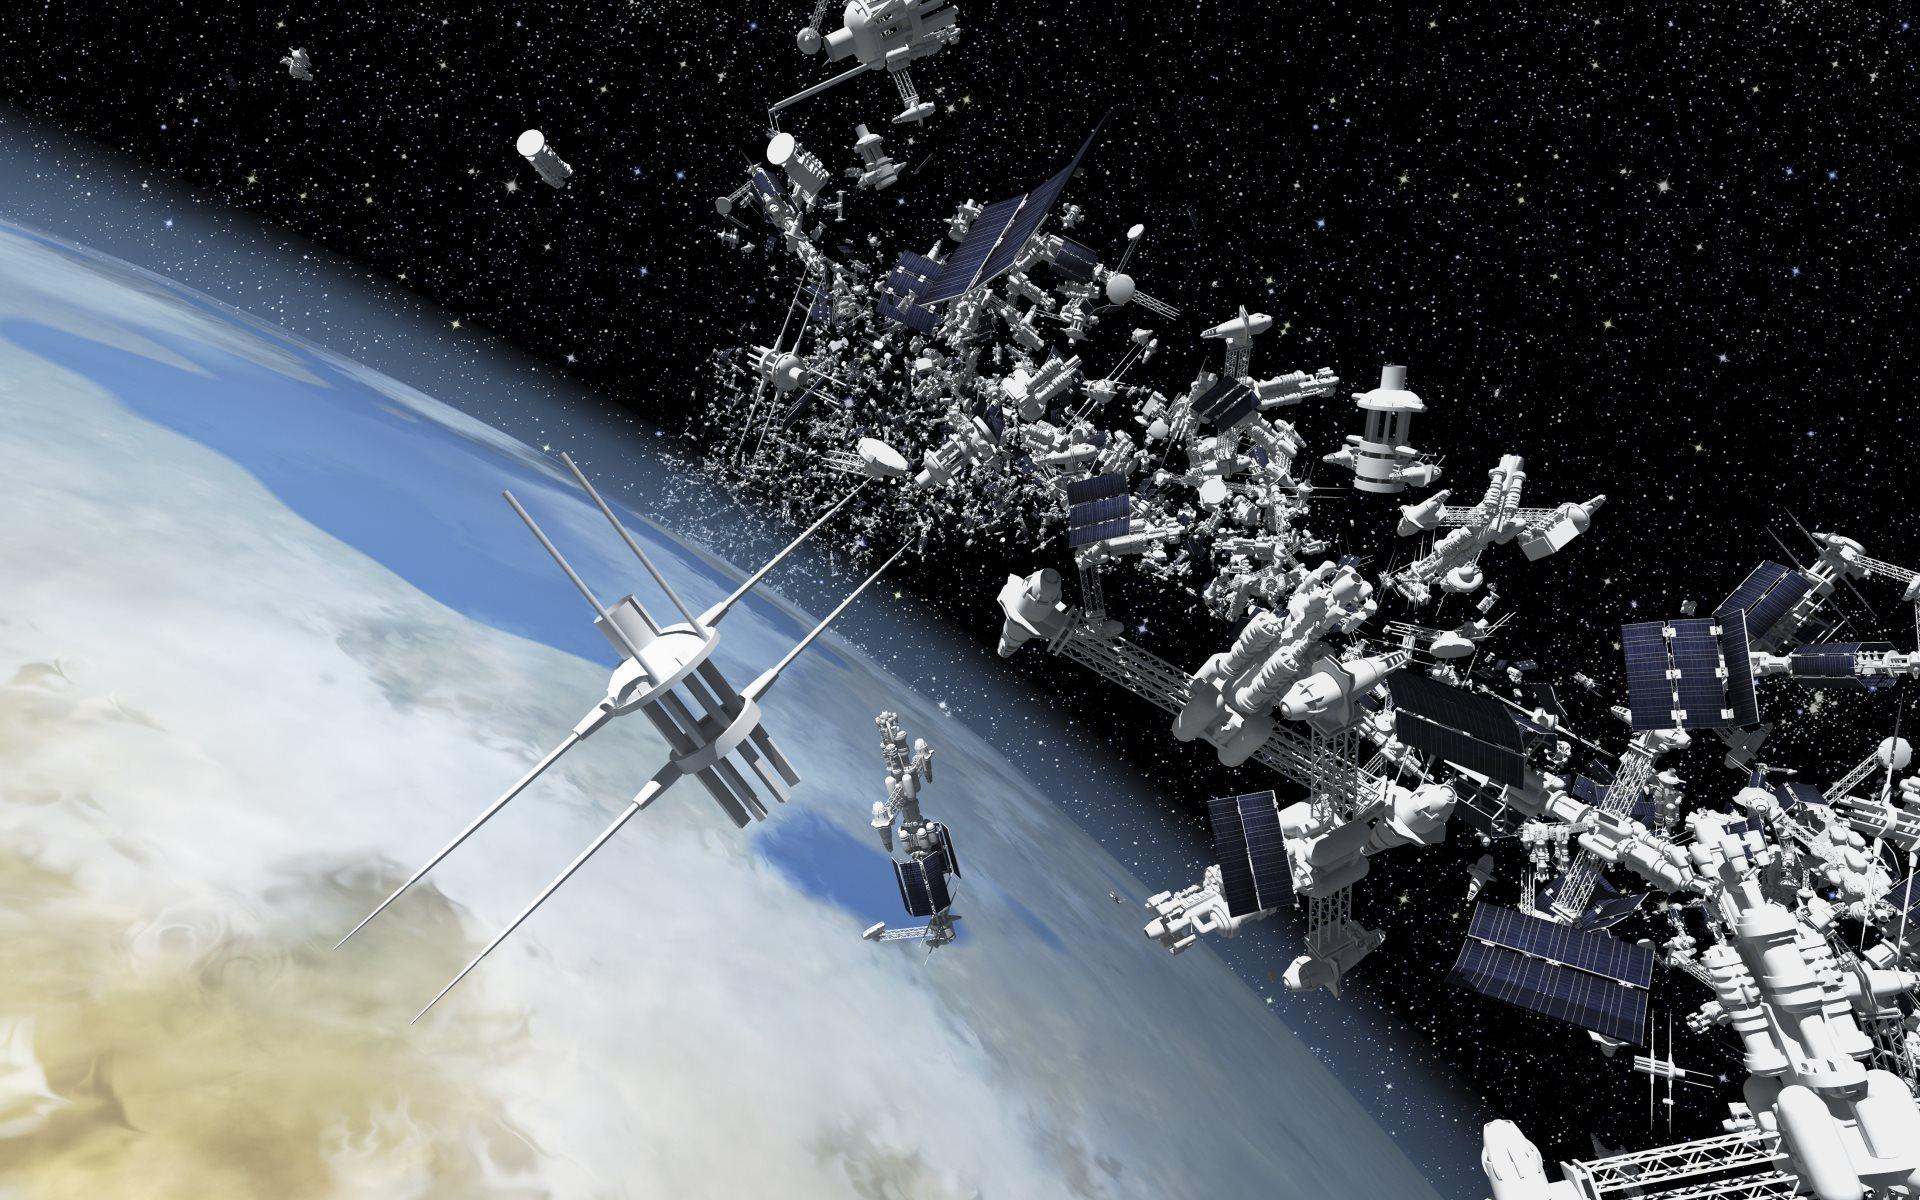 basura-espacial-240413.jpg